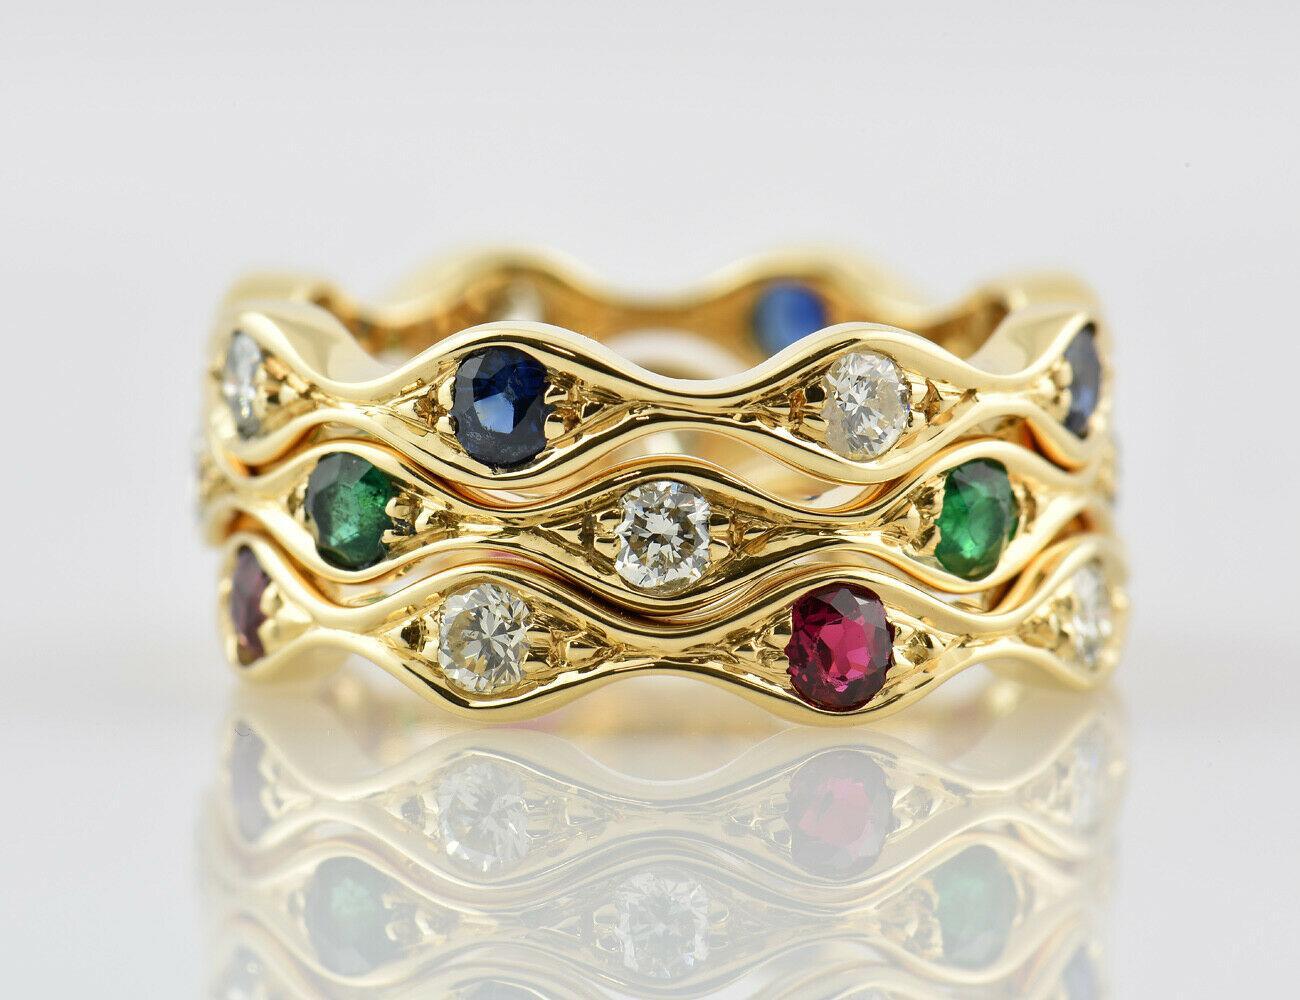 Diamant, Saphir, Smaragd, Rubin, Ring 750 18 K Gold 12 Brillanten zus. 0,80 ct